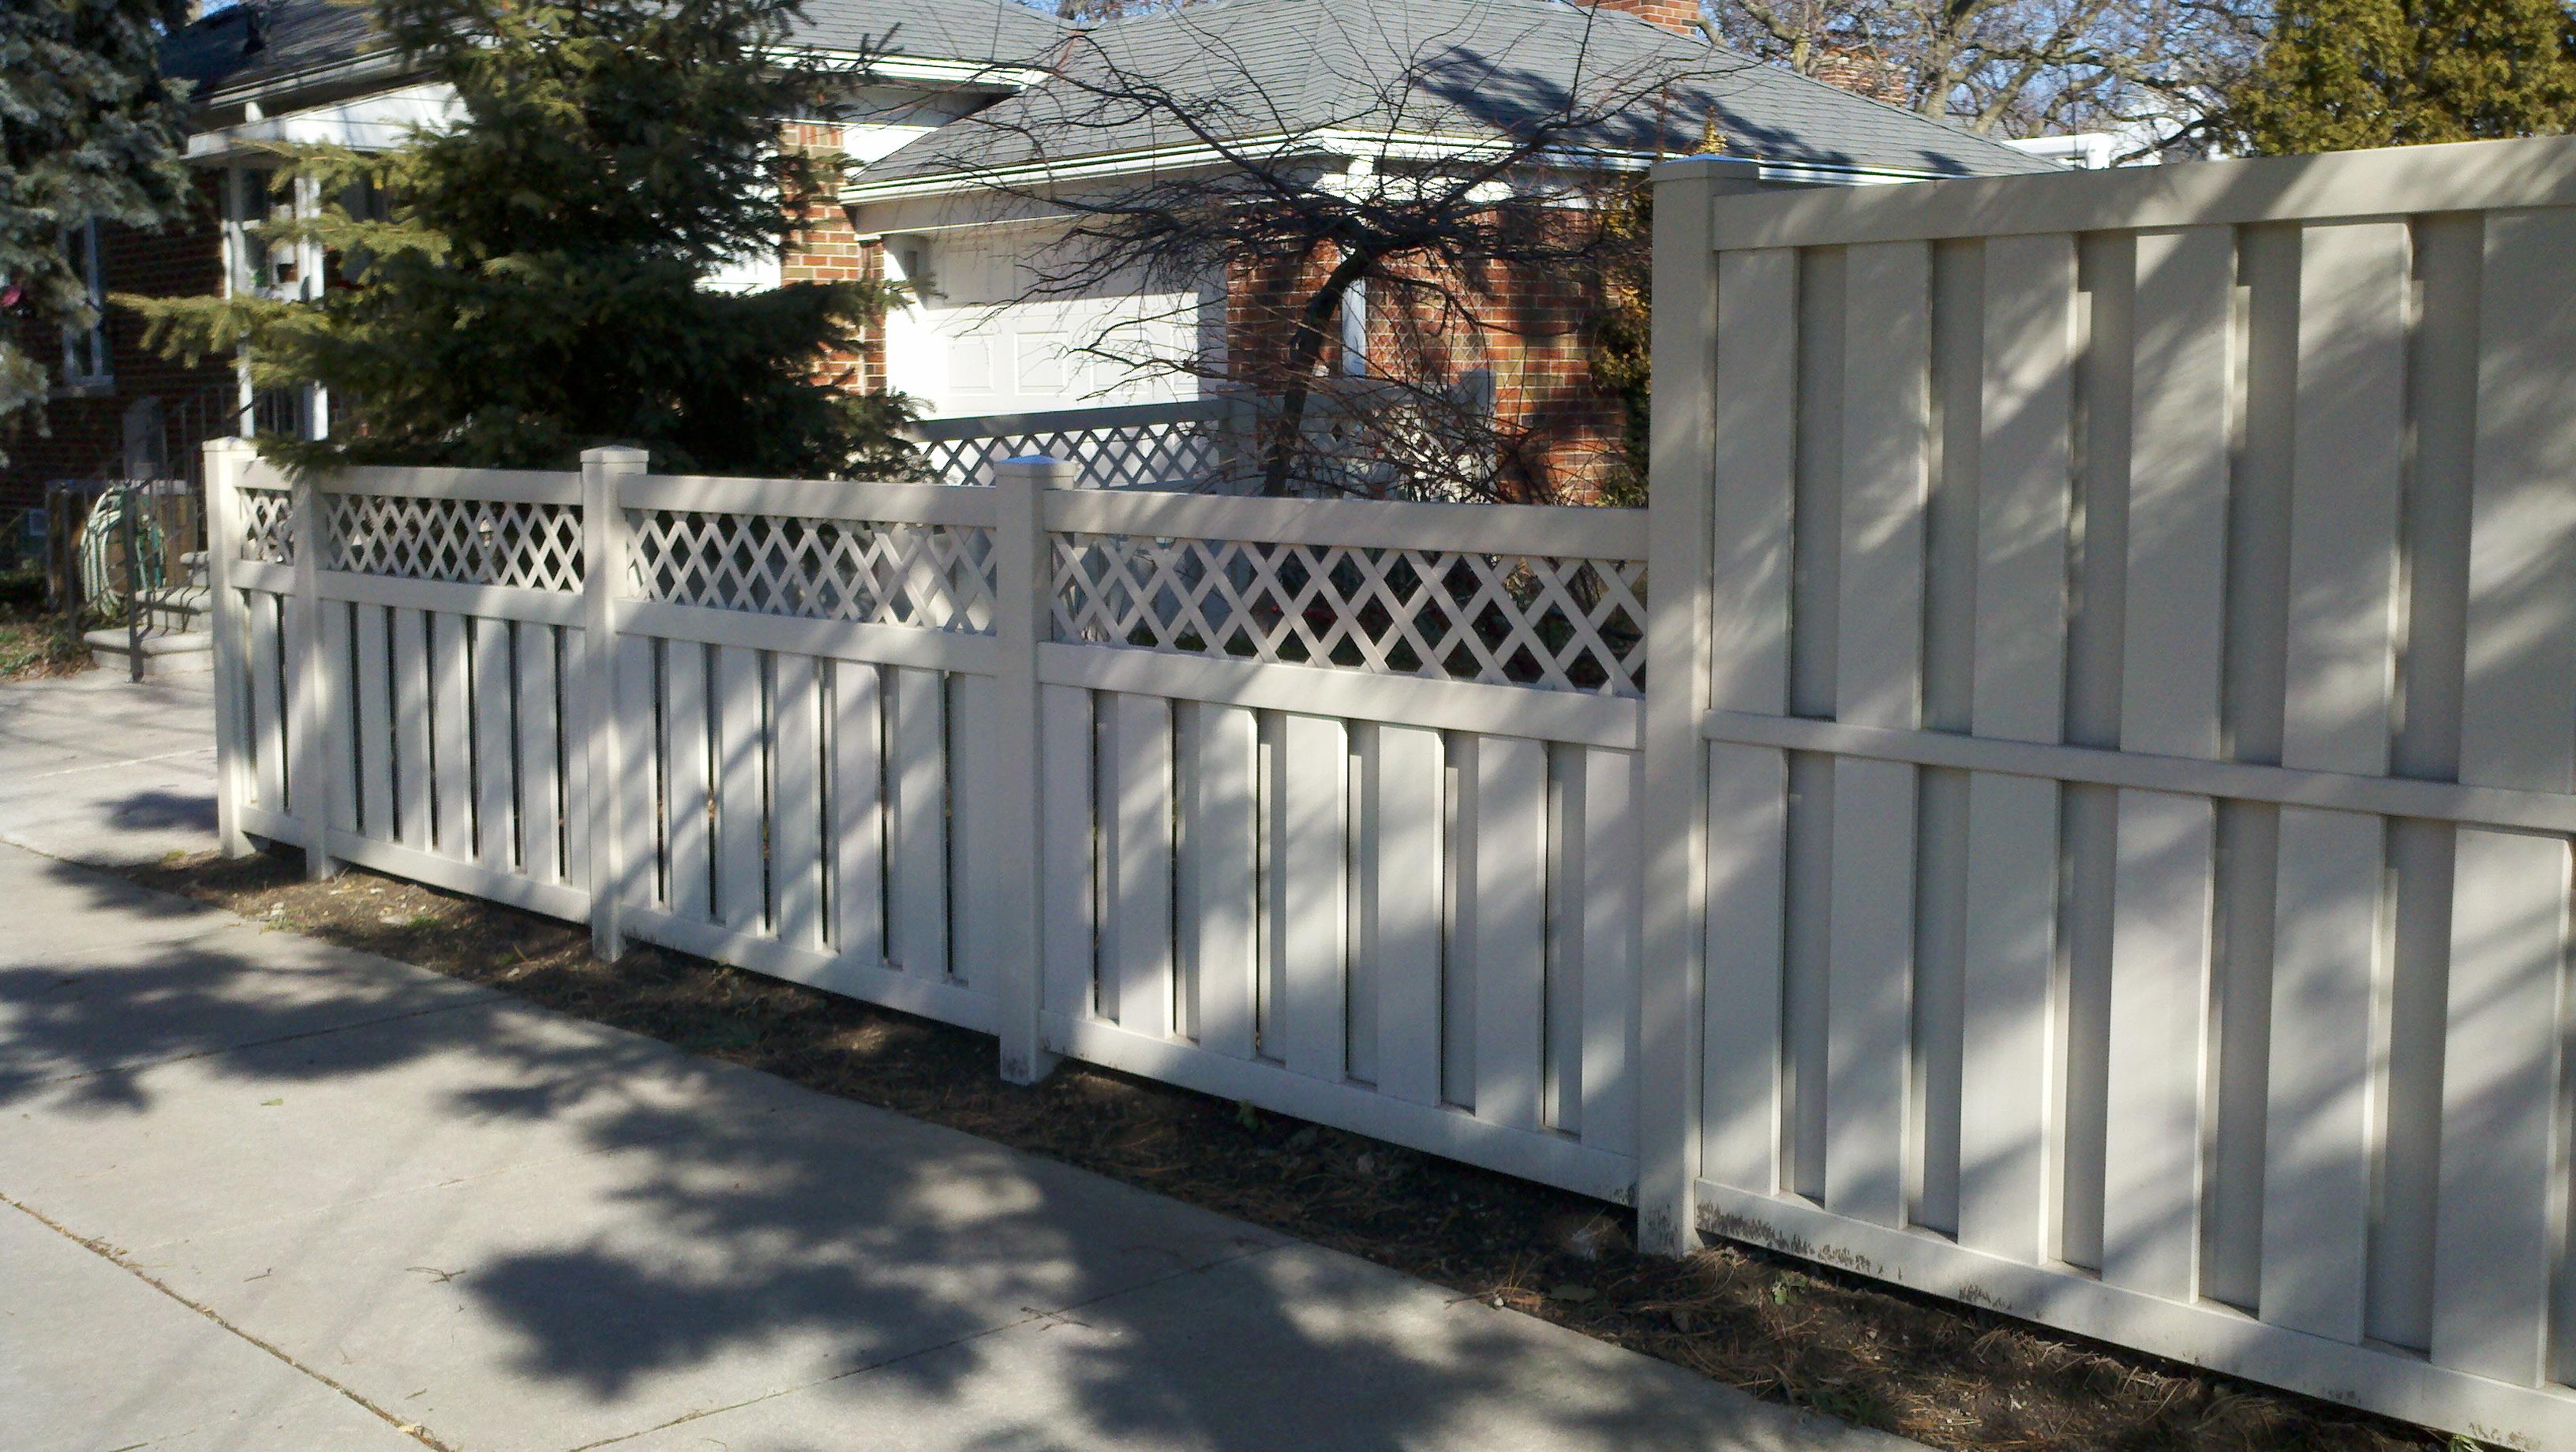 Robust Vinyl Fencing Shadow Box Fence Board Spacing Shadow Box Fence Brackets Tan Vinyl Shadow Box Fence Flat Cap Posts Pvc Lattice houzz-03 Shadow Box Fence